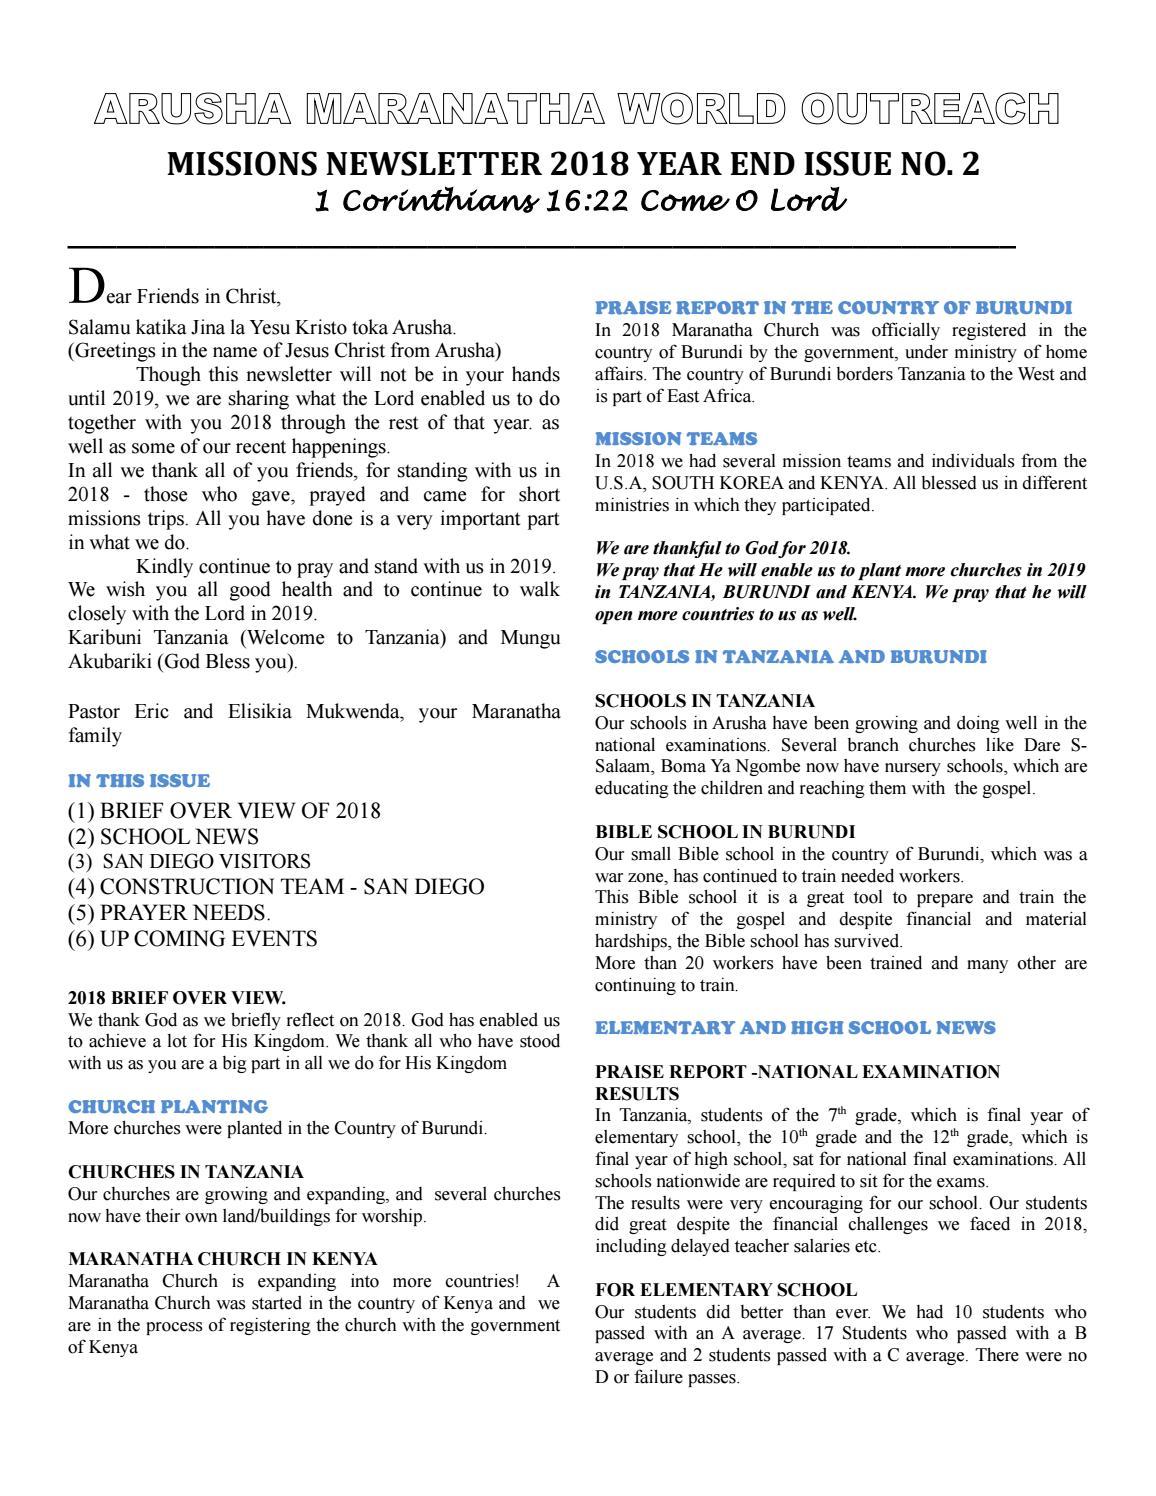 Arusha Maranatha World Outreach Newsletter by Eva Sonko - issuu